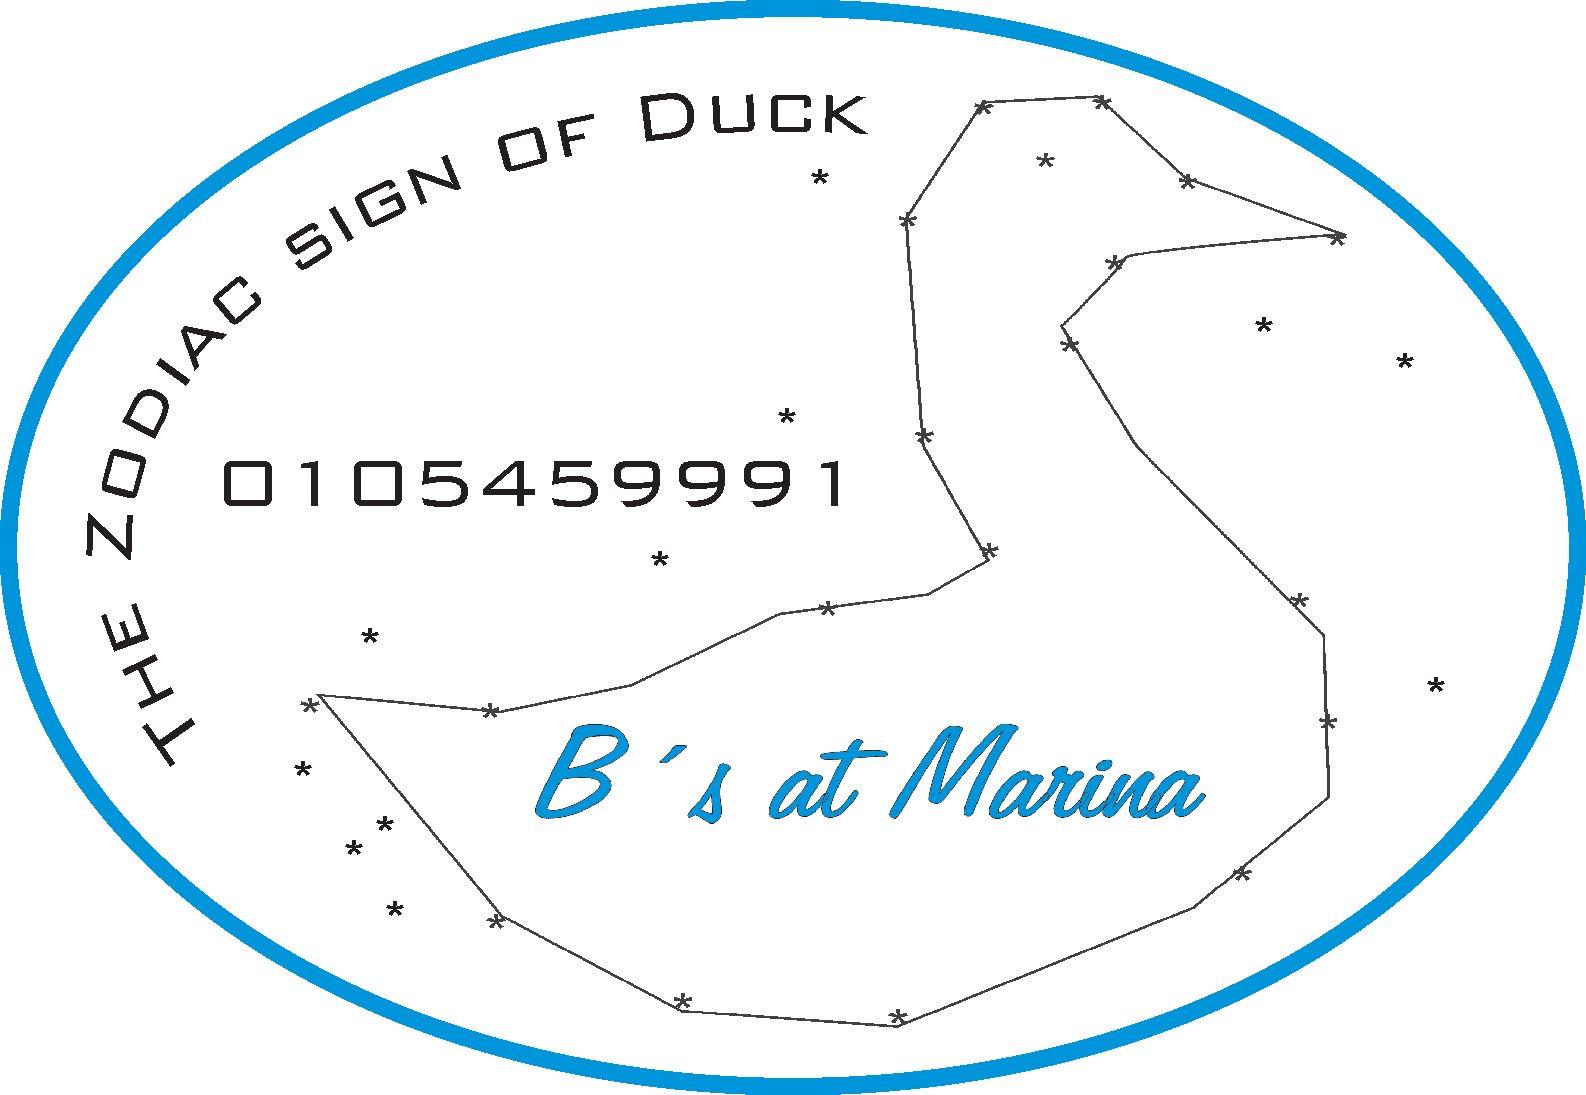 zodiac_sign_of_duck.jpg